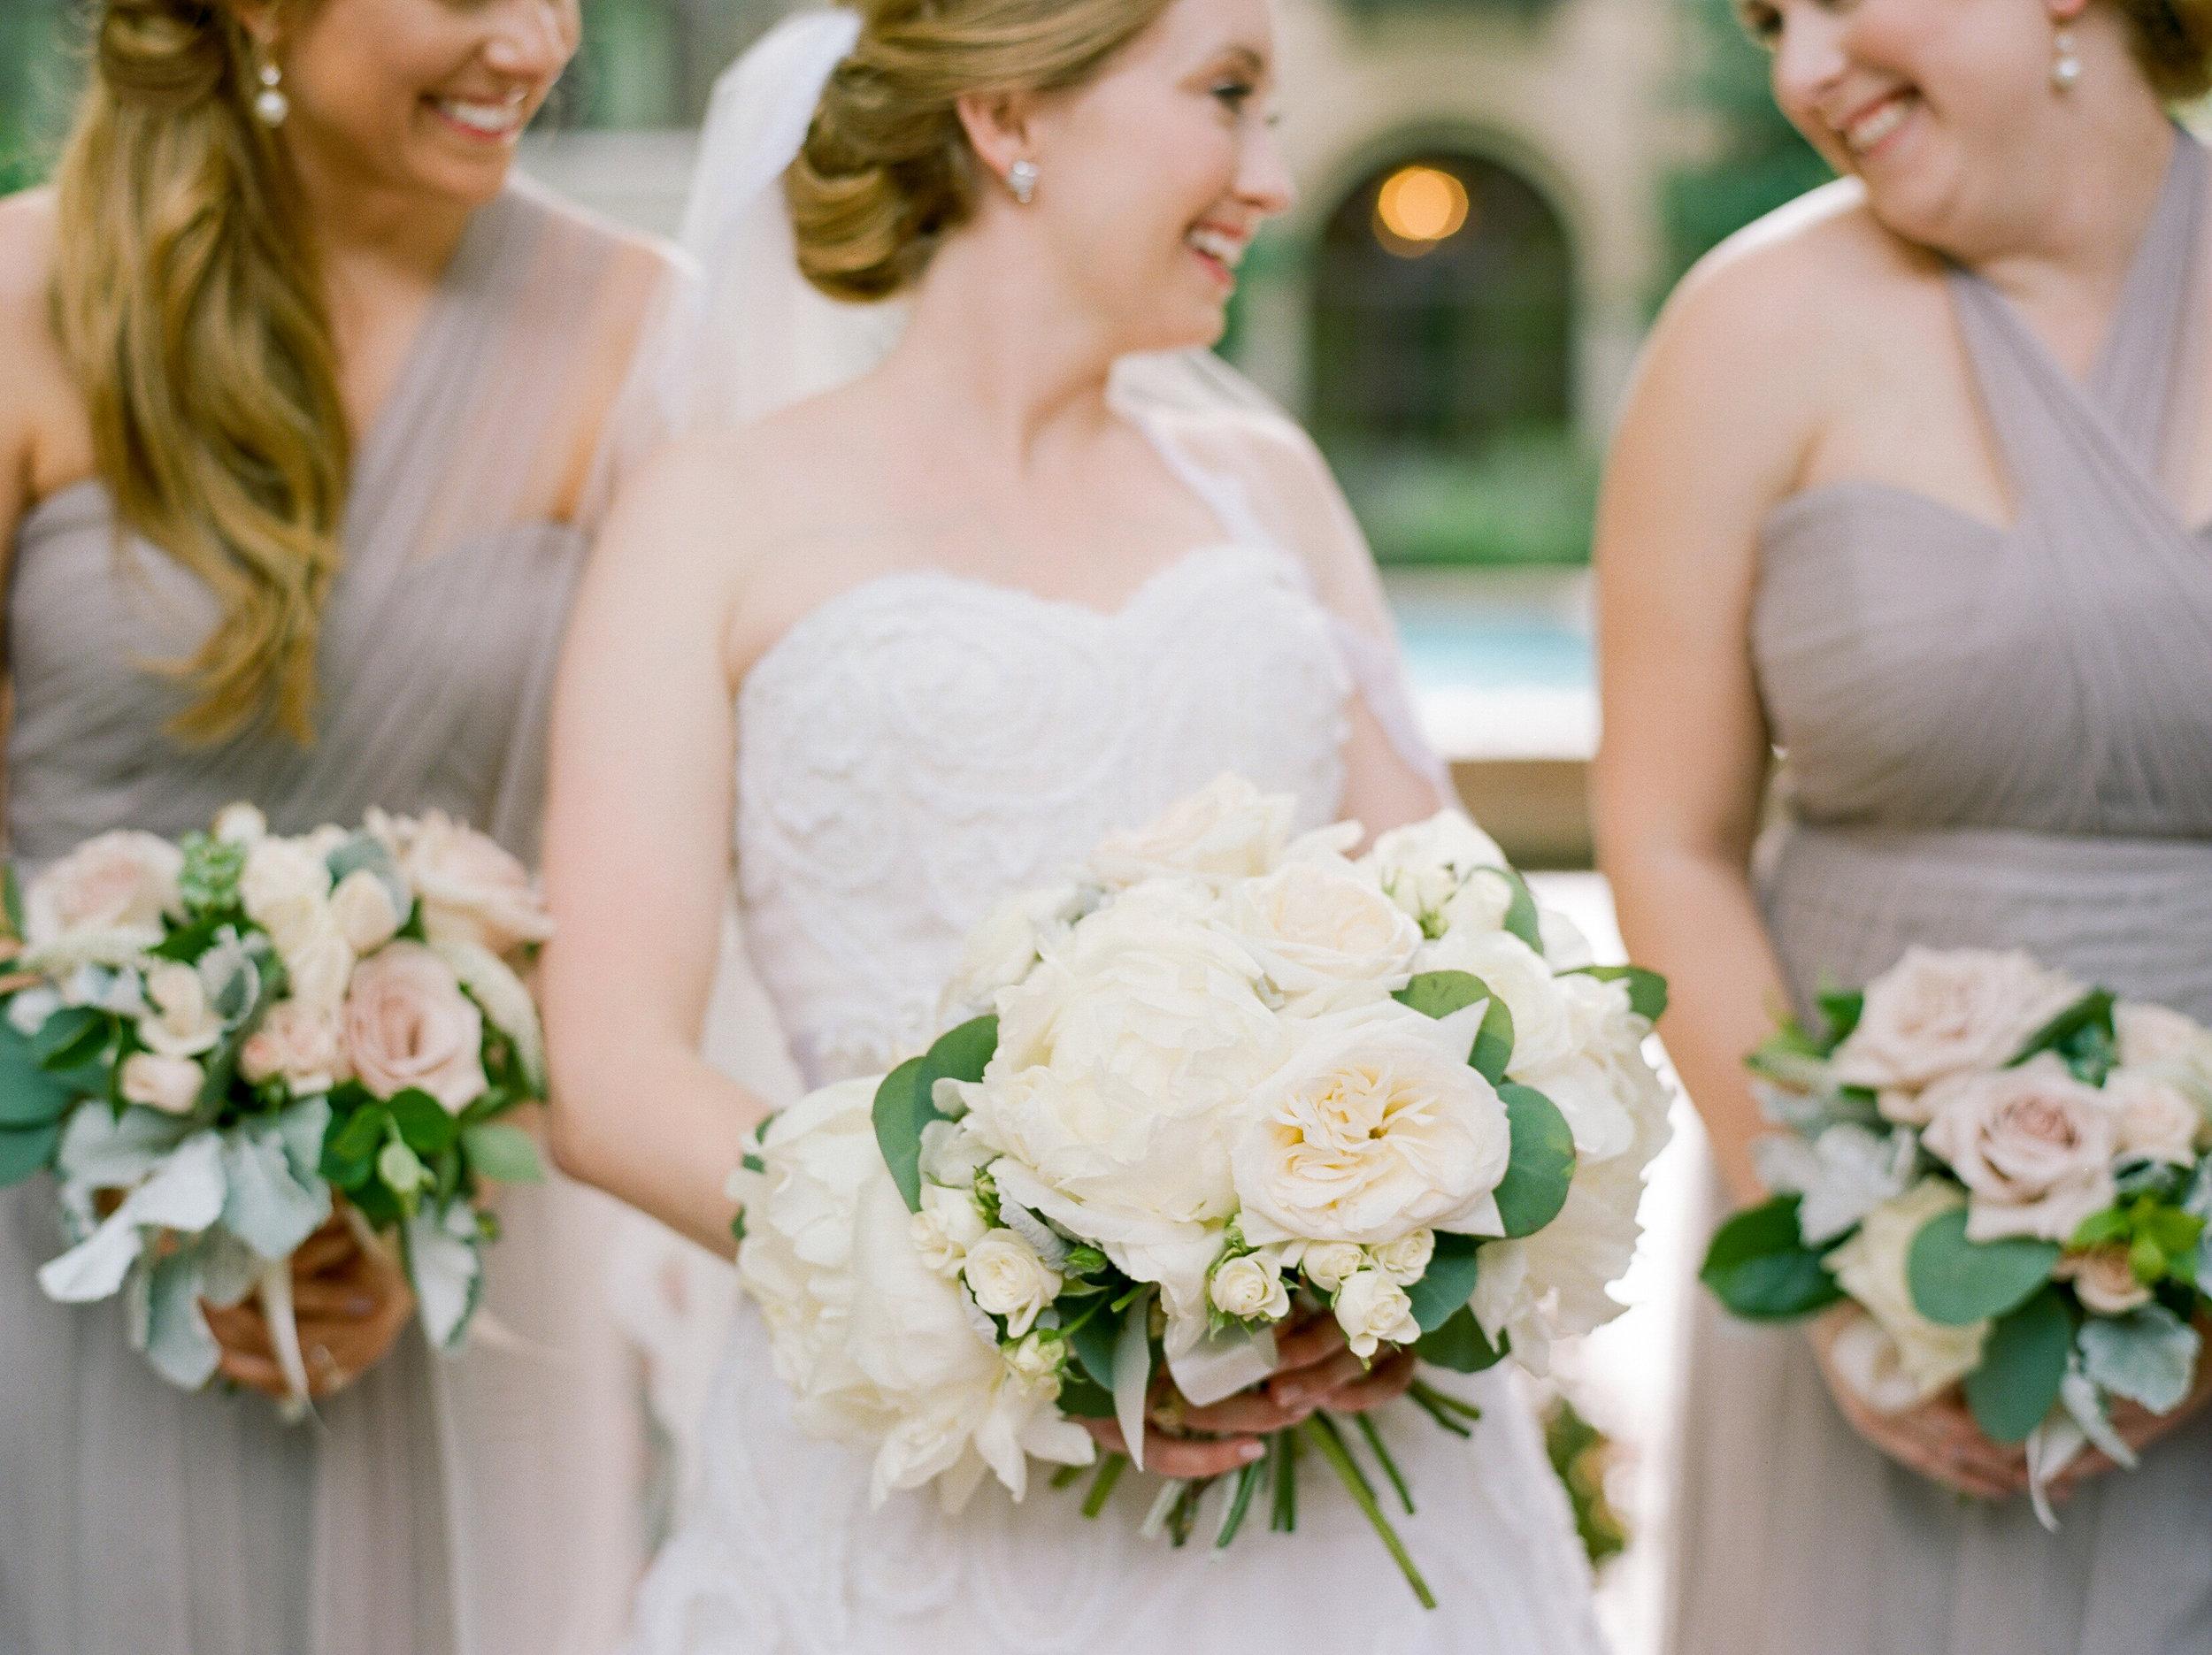 Fine-Art-Film-Houston-Wedding-Photographer-Best-Top-Luxury-Texas-Austin-Dallas-Destination-Dana-Fernandez-Photography-River-Oaks-Country-Club-South-Main-Baptist-Ceremony-Reception-Wedding-28.jpg